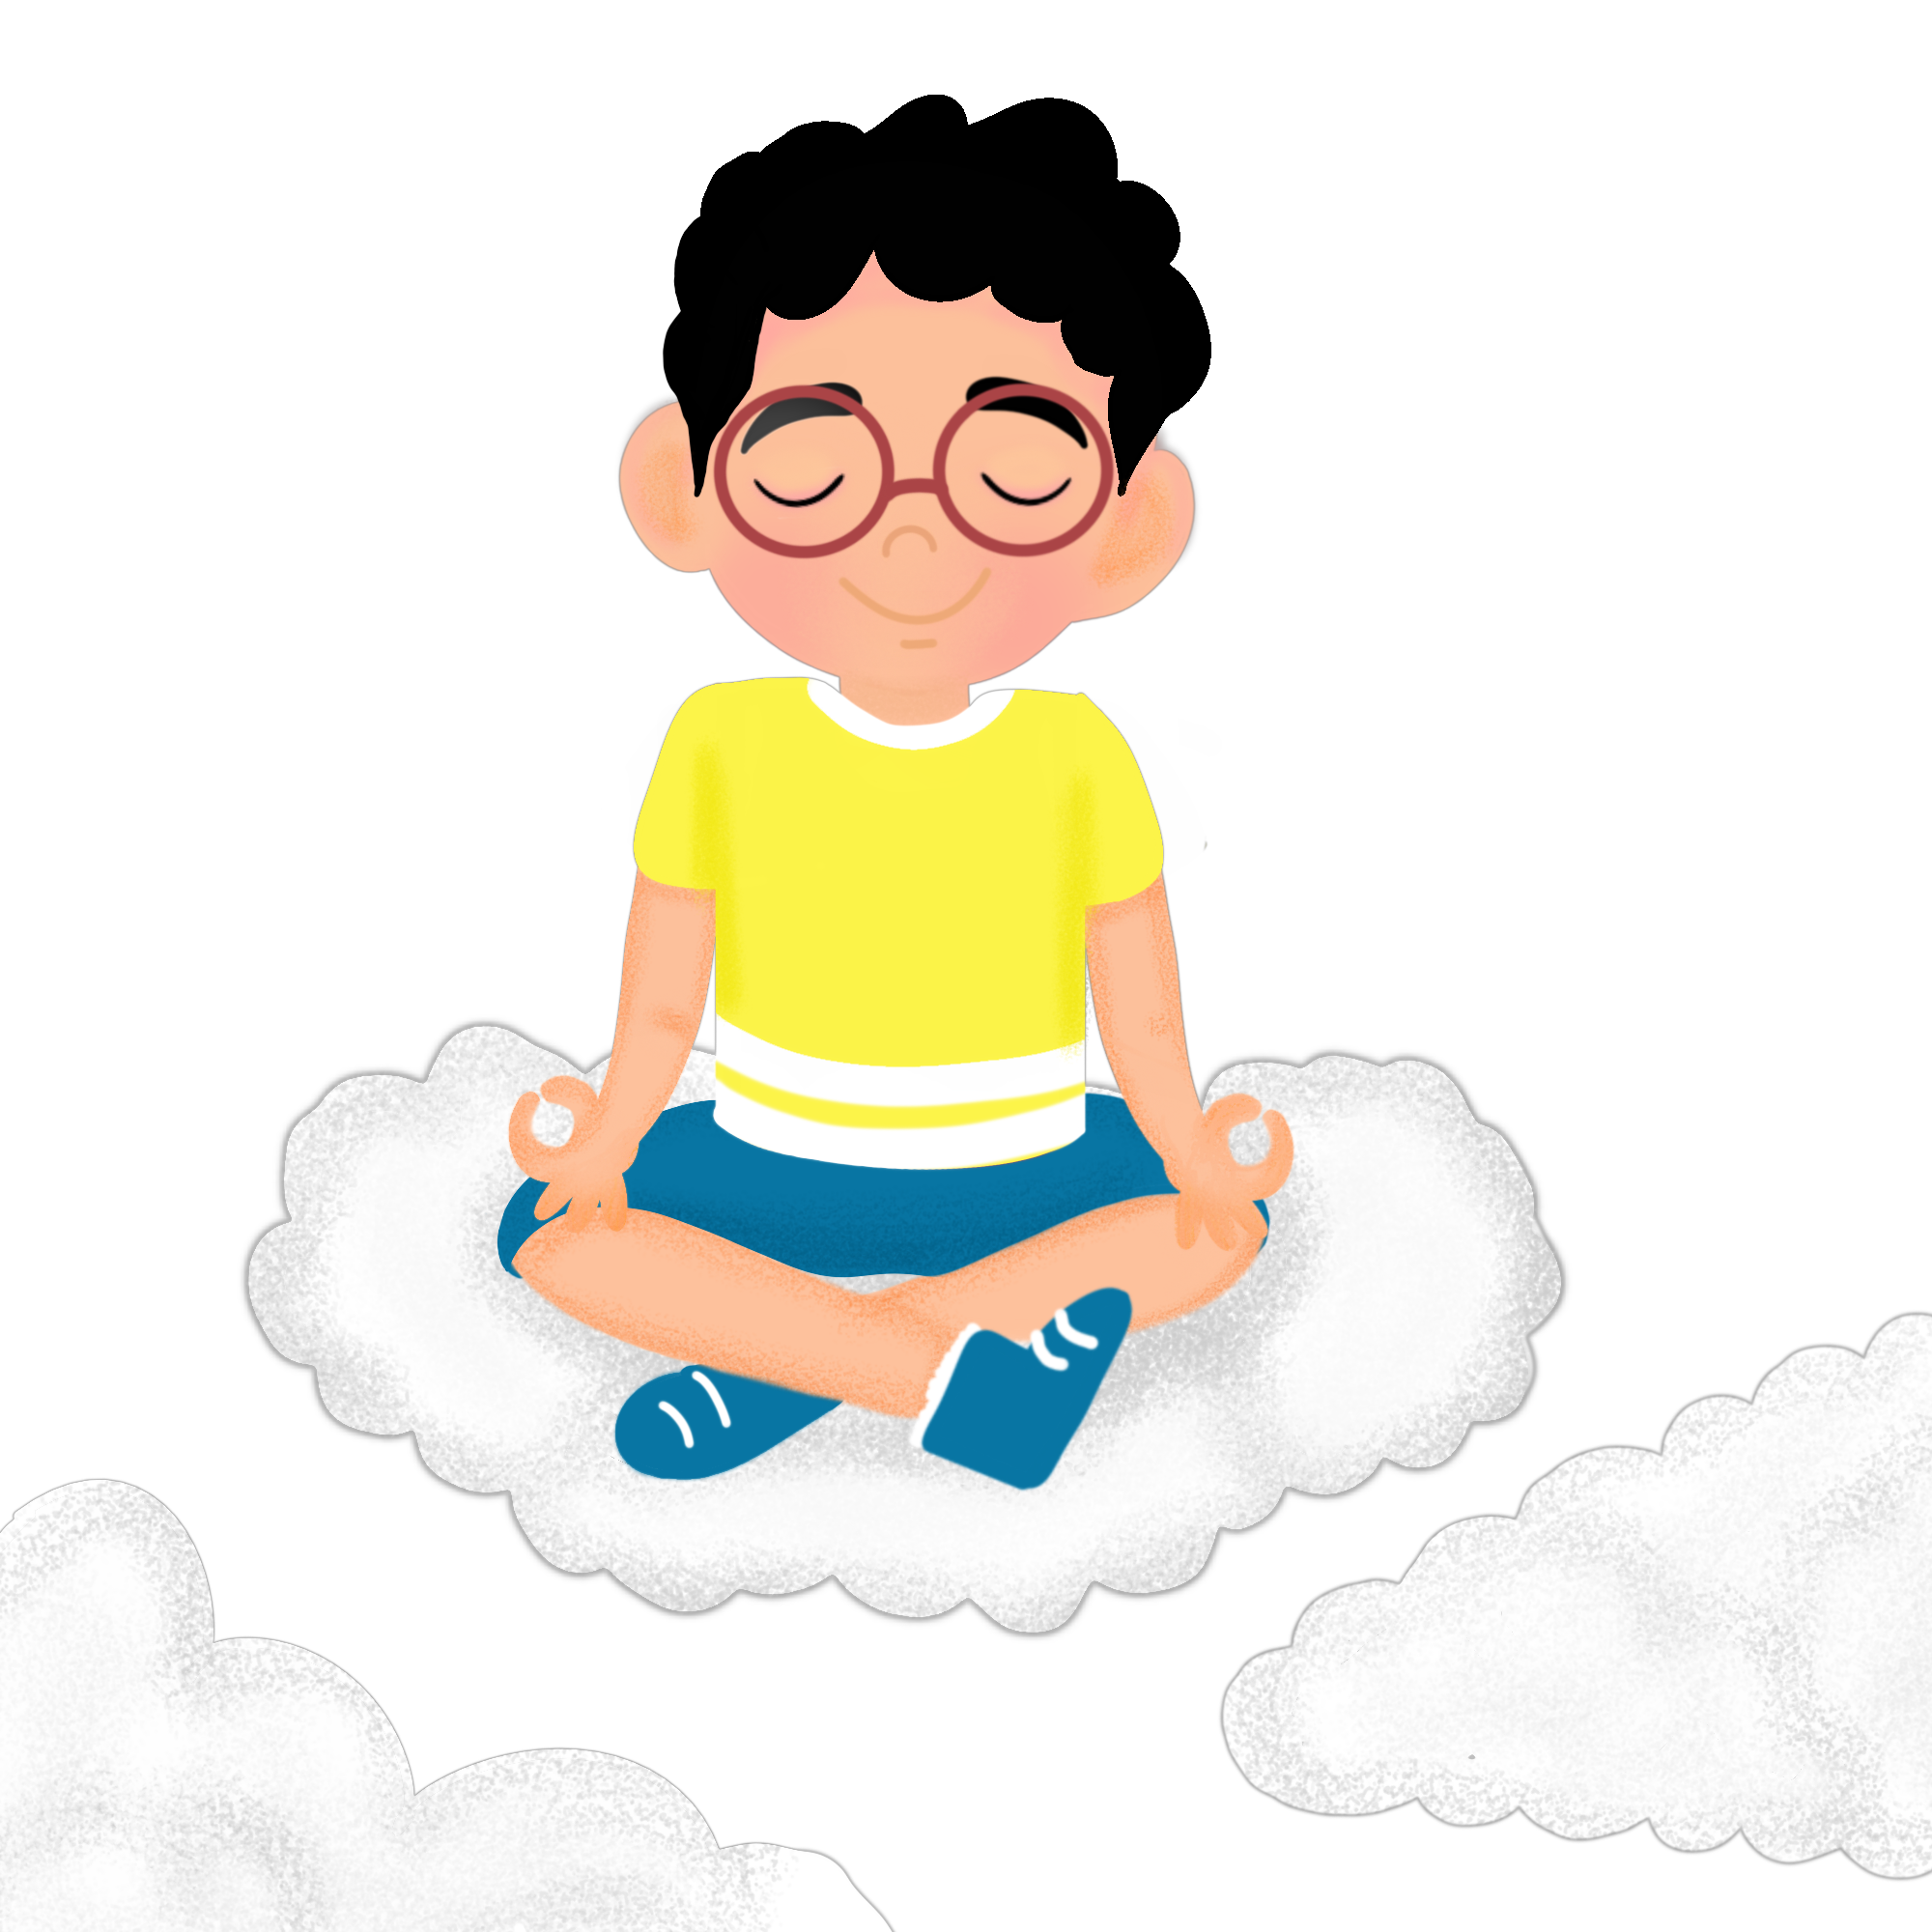 meditate kid without bg